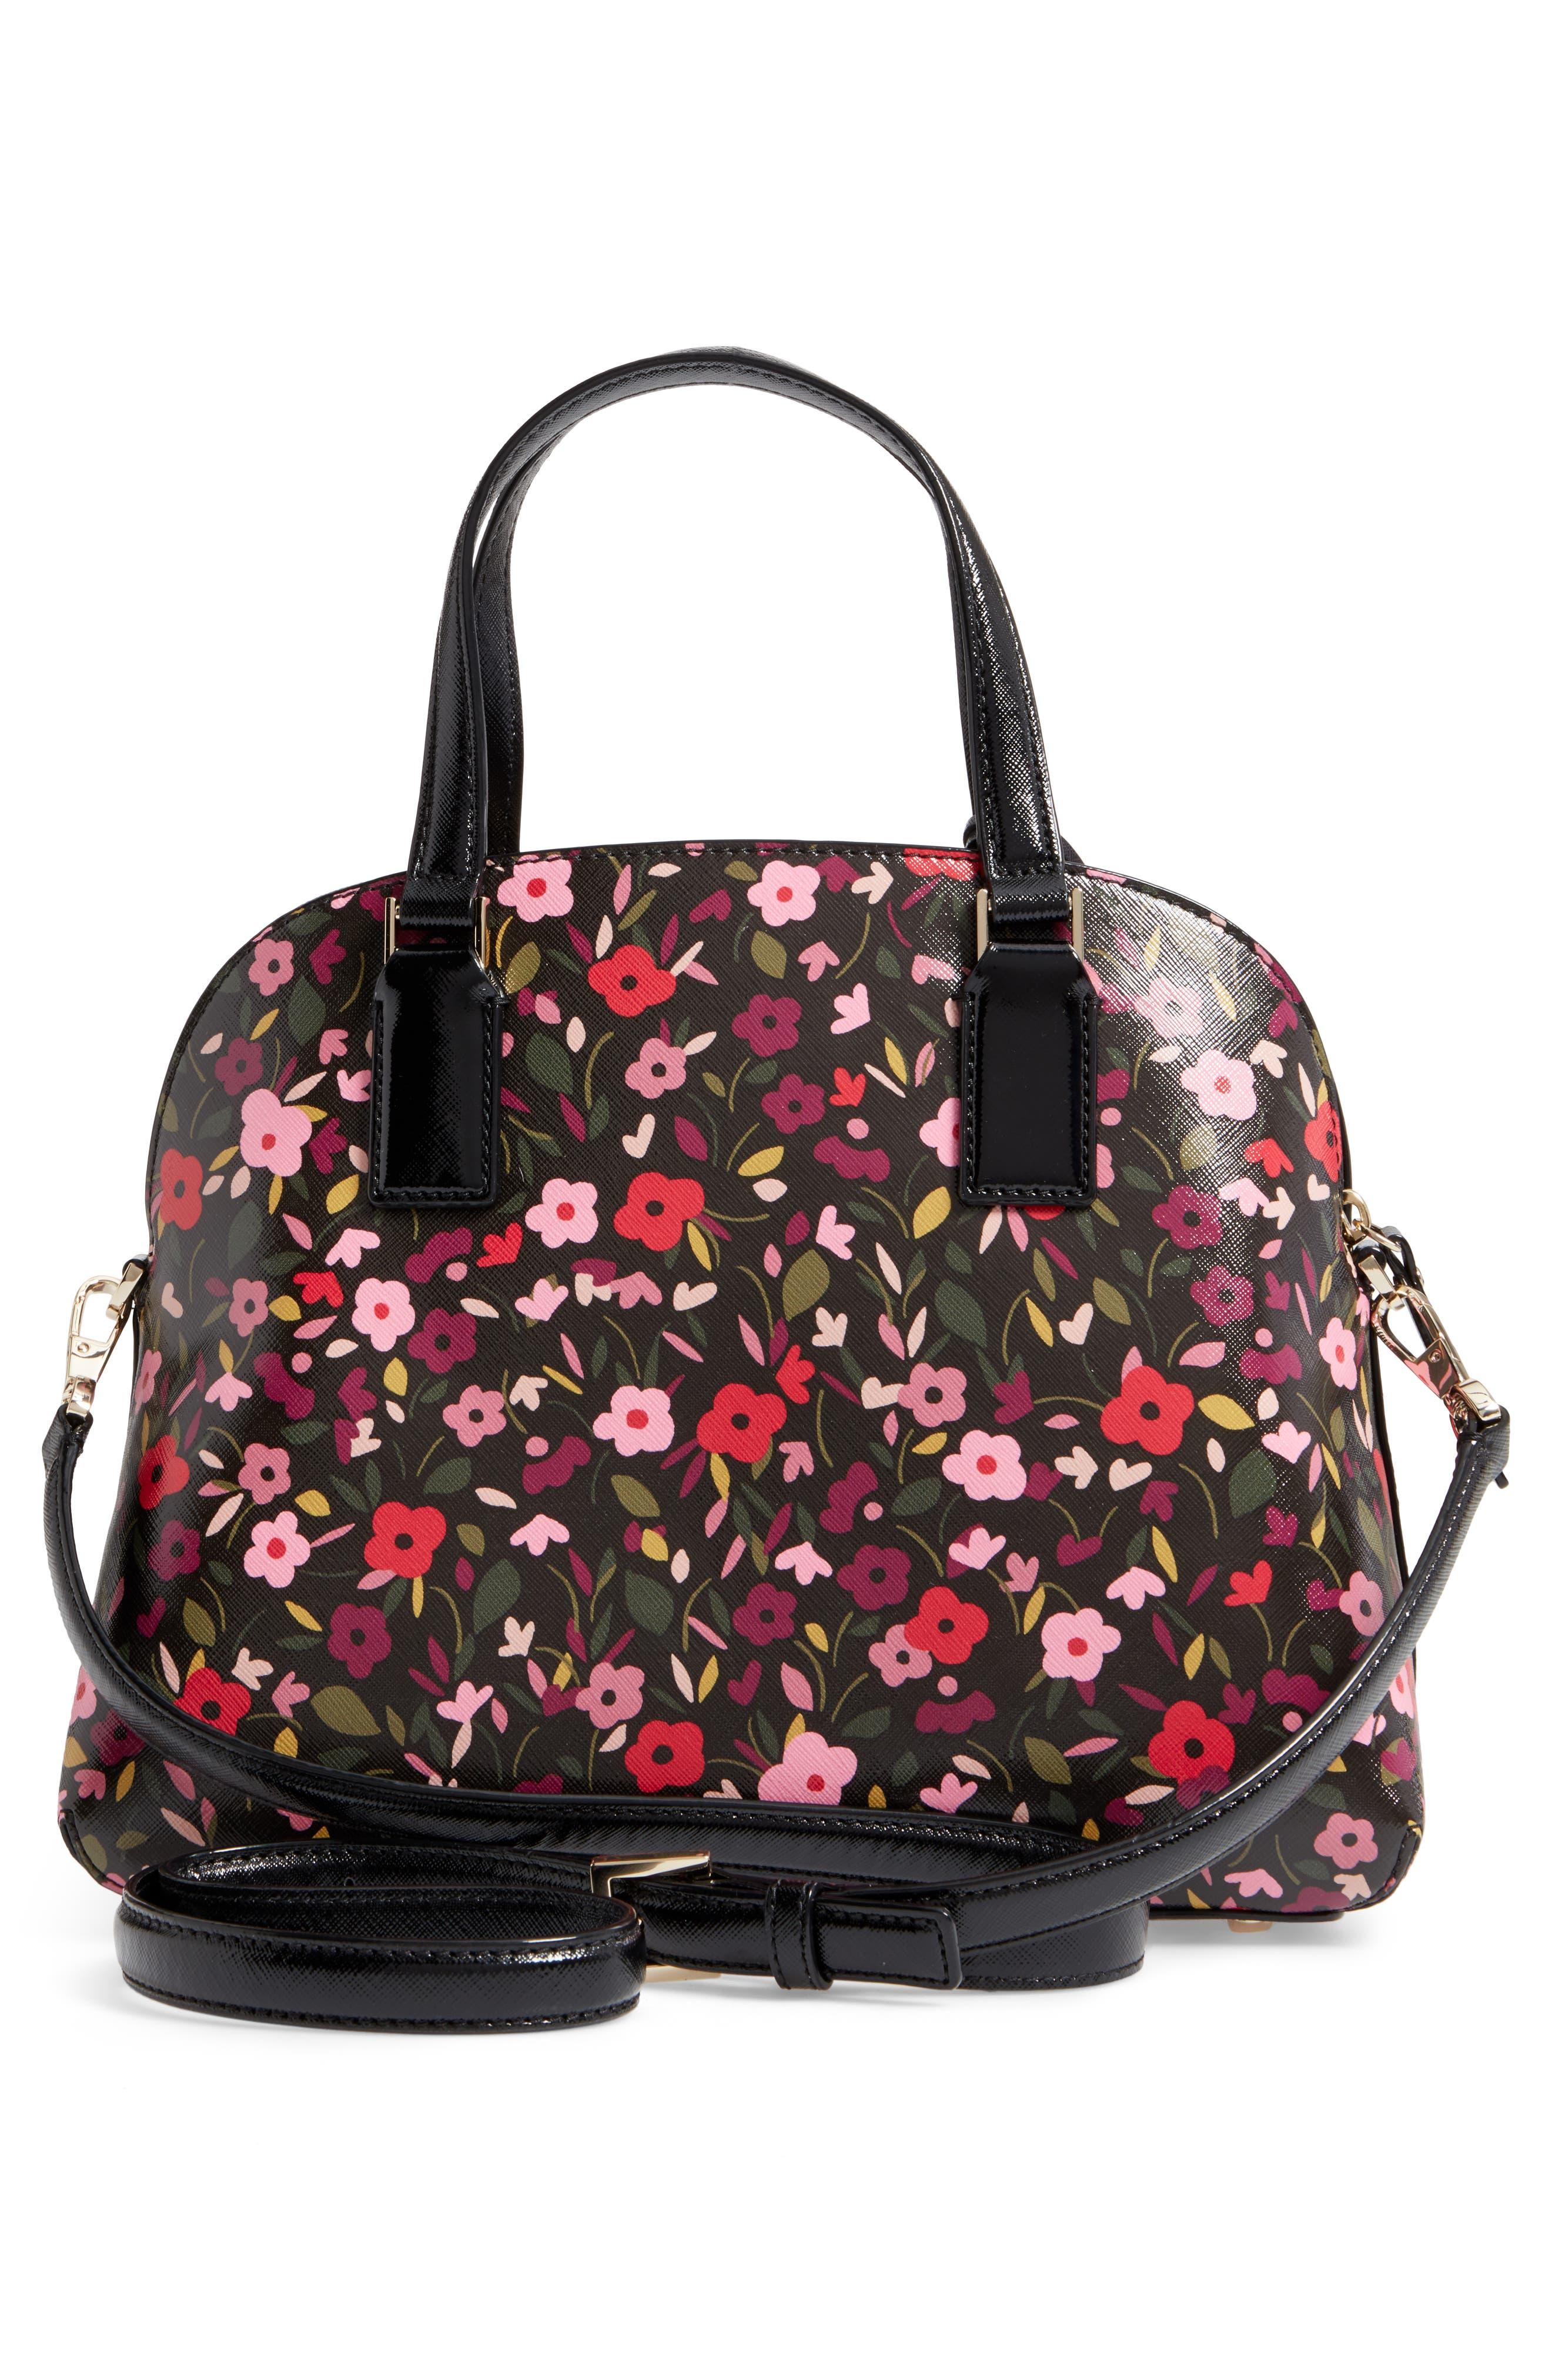 cameron street boho floral- lottie leather satchel,                             Alternate thumbnail 3, color,                             001